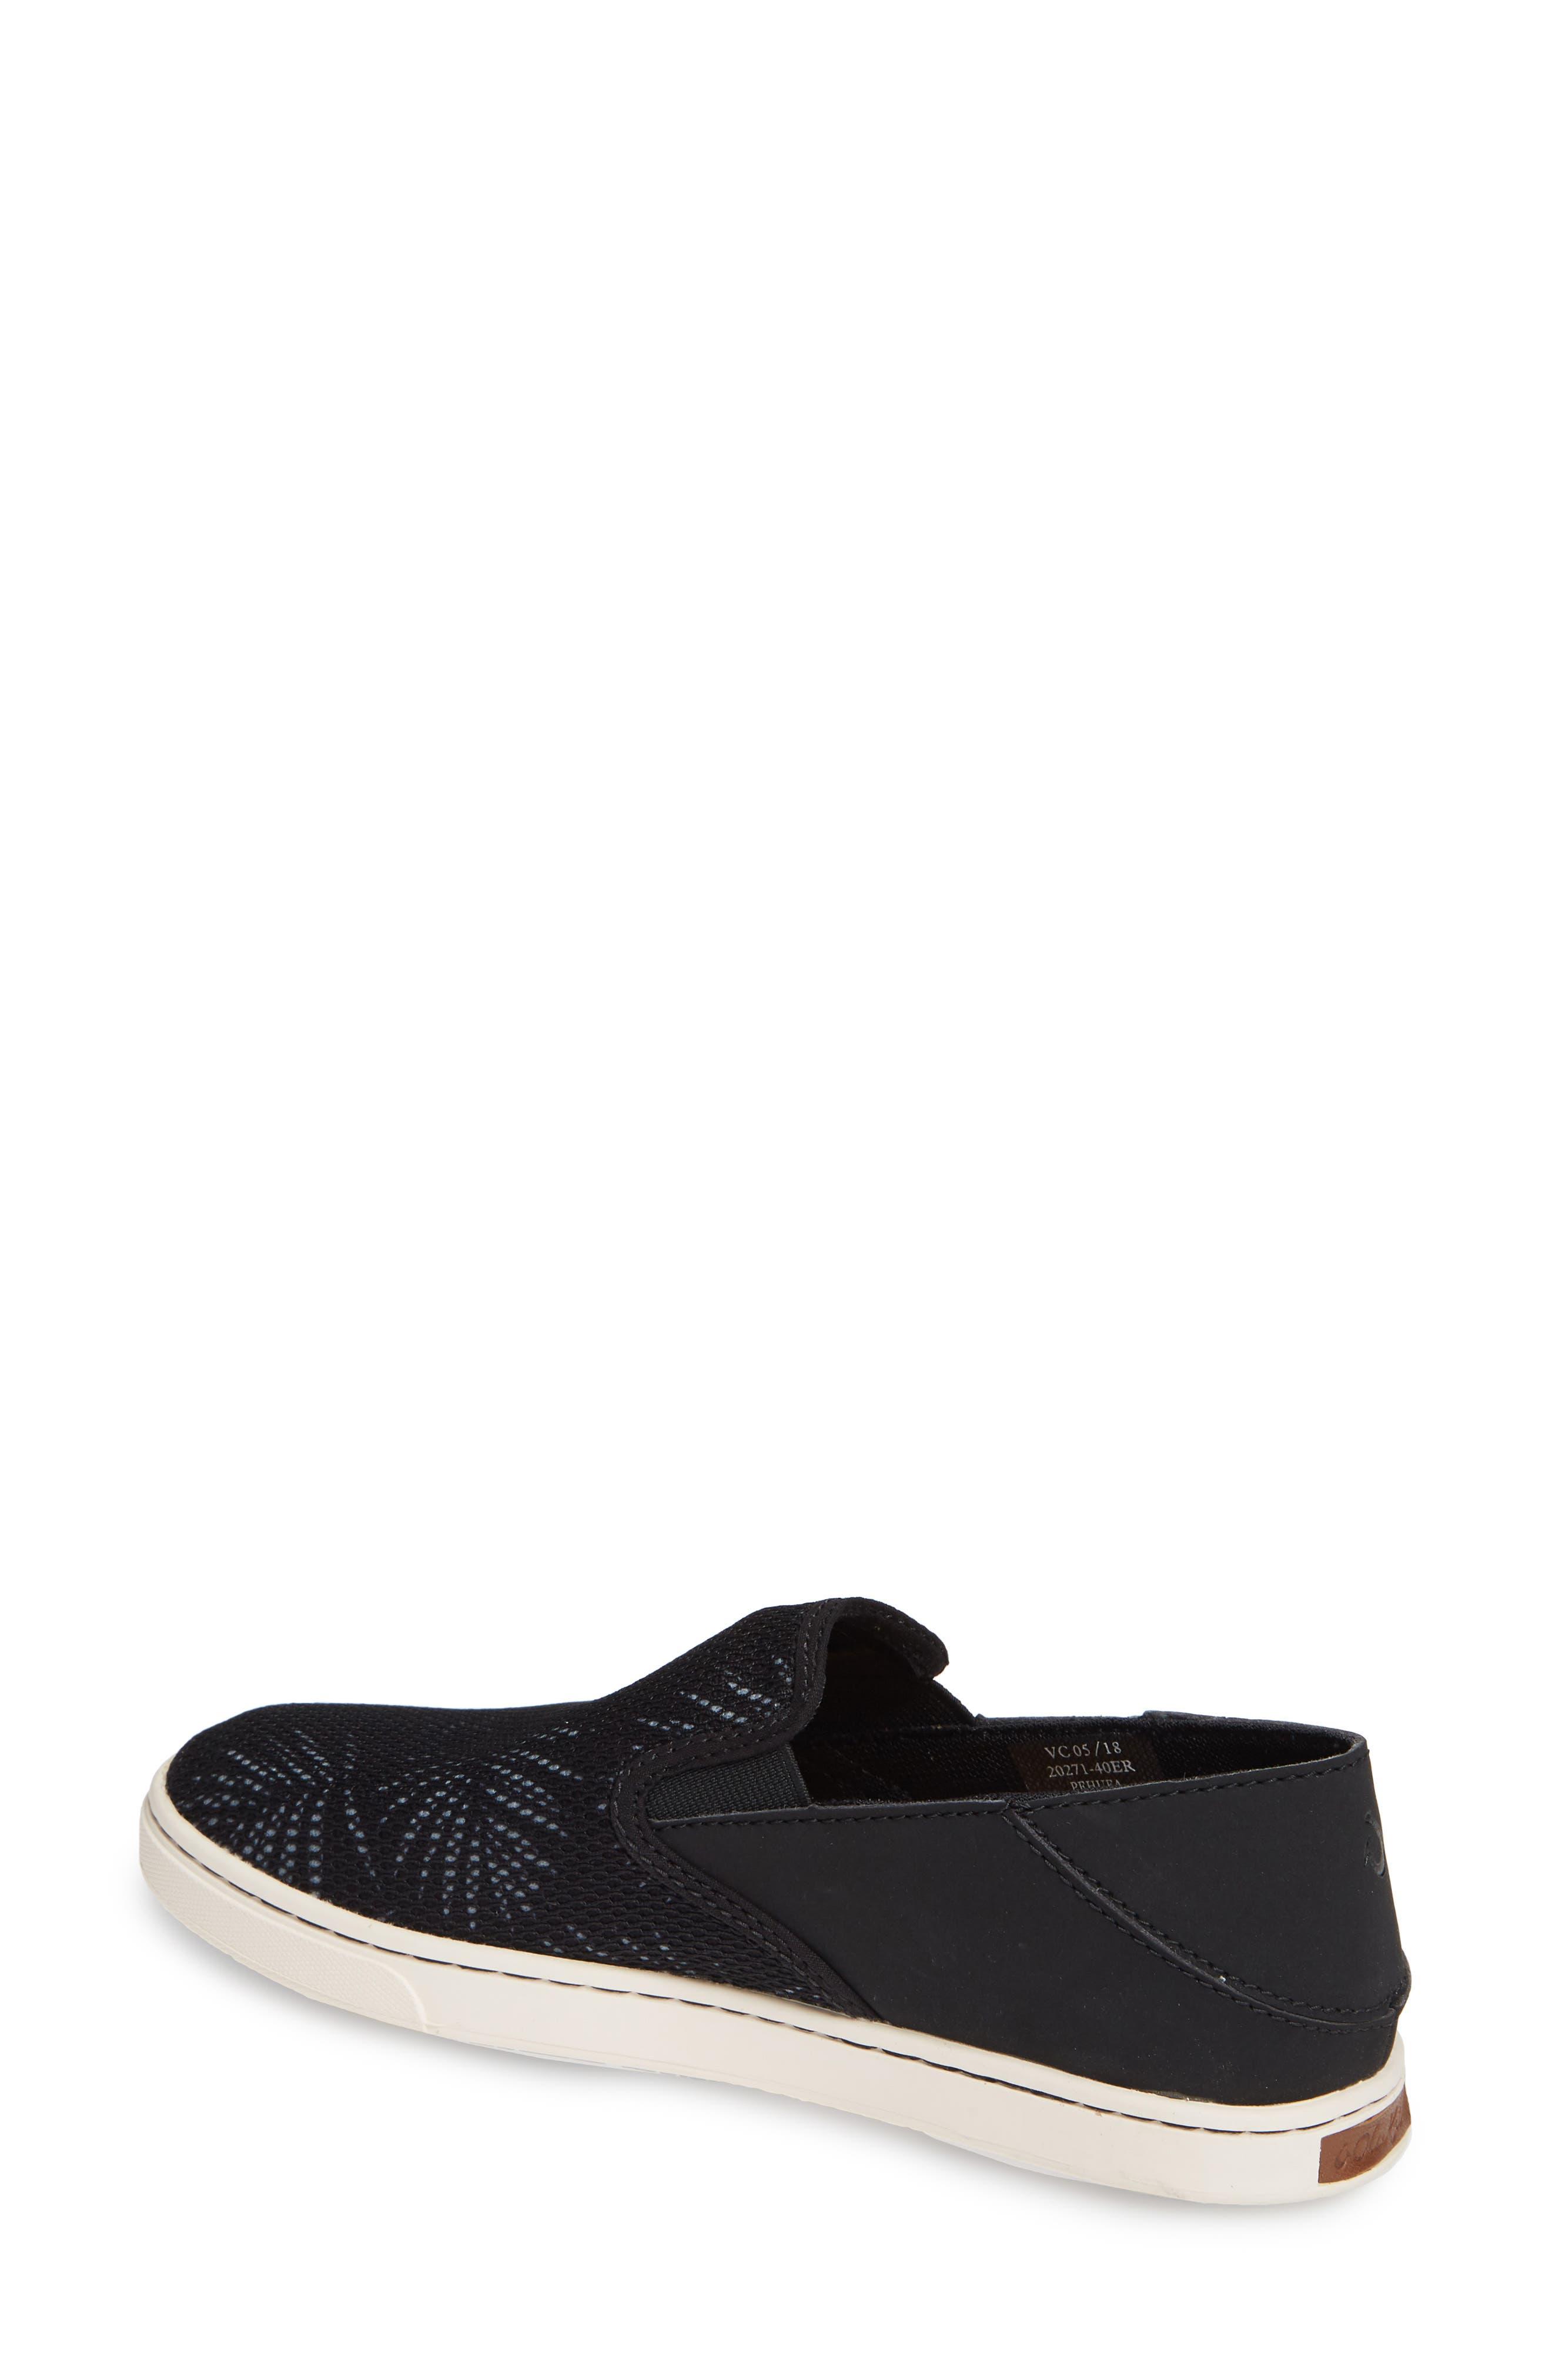 'Pehuea' Slip-On Sneaker,                             Alternate thumbnail 2, color,                             BLACK/ PALM FABRIC